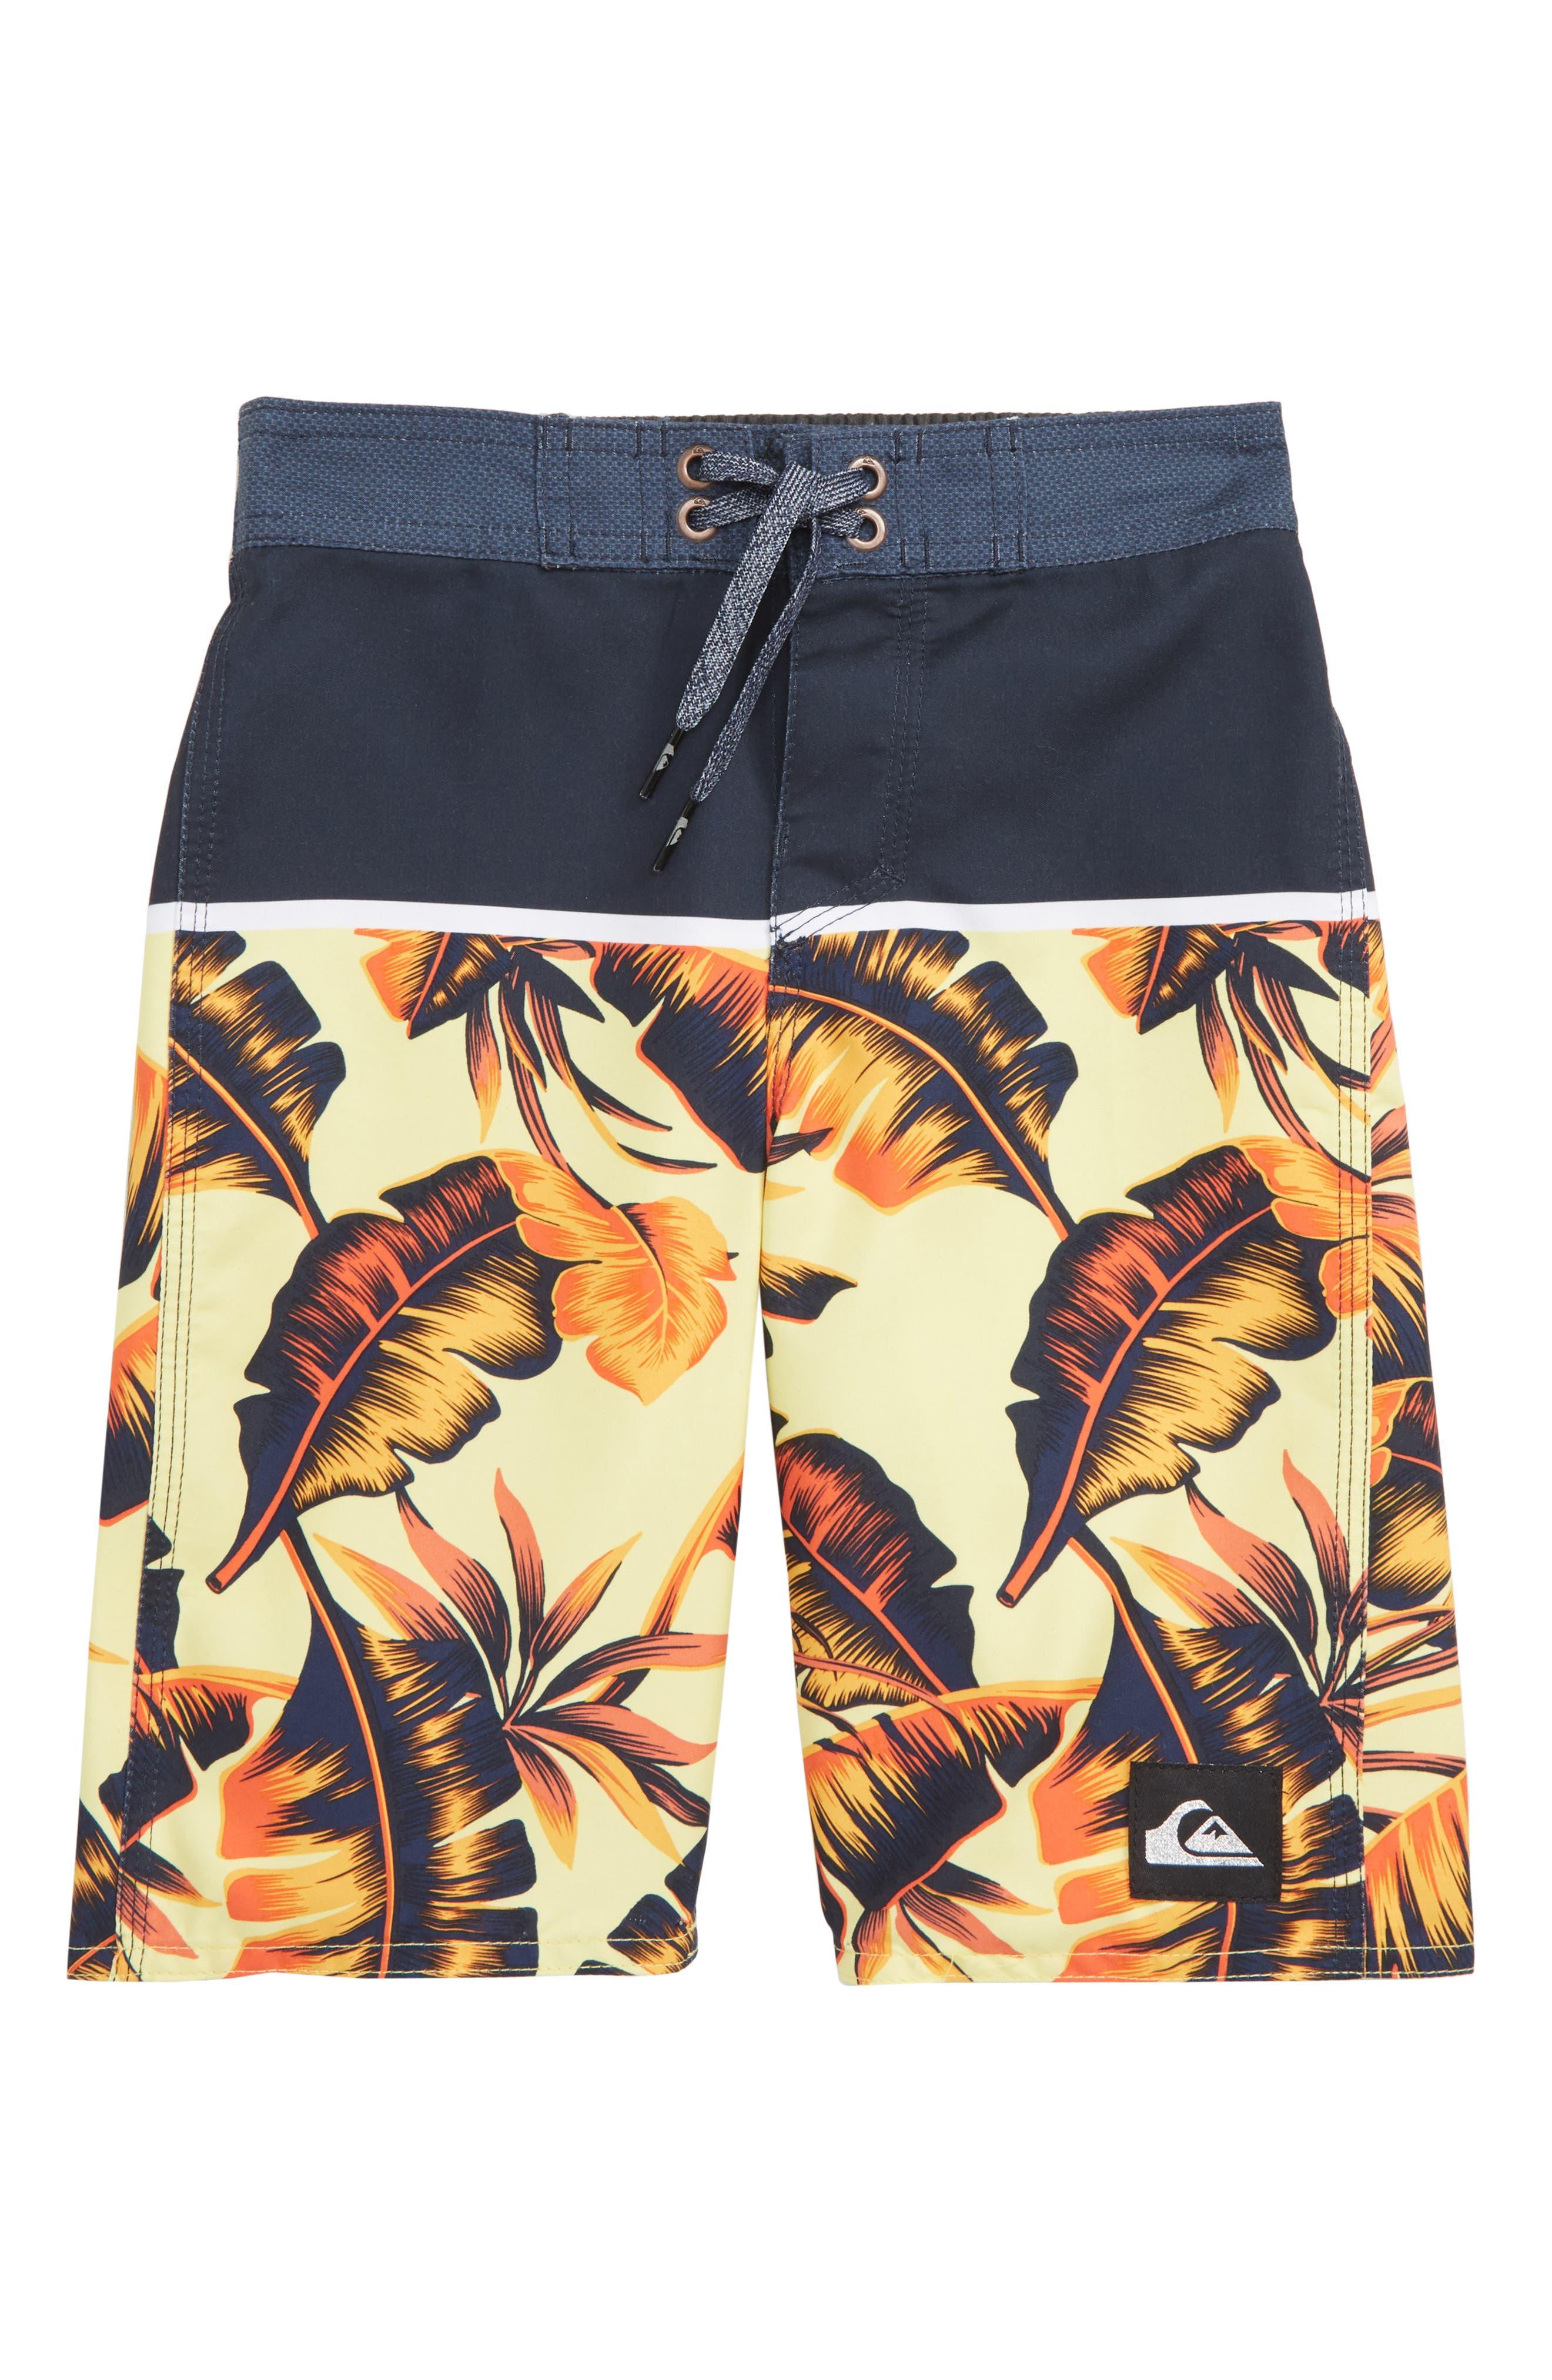 QUIKSILVER,                             Everyday Noosa Board Shorts,                             Main thumbnail 1, color,                             NAVY BLAZER